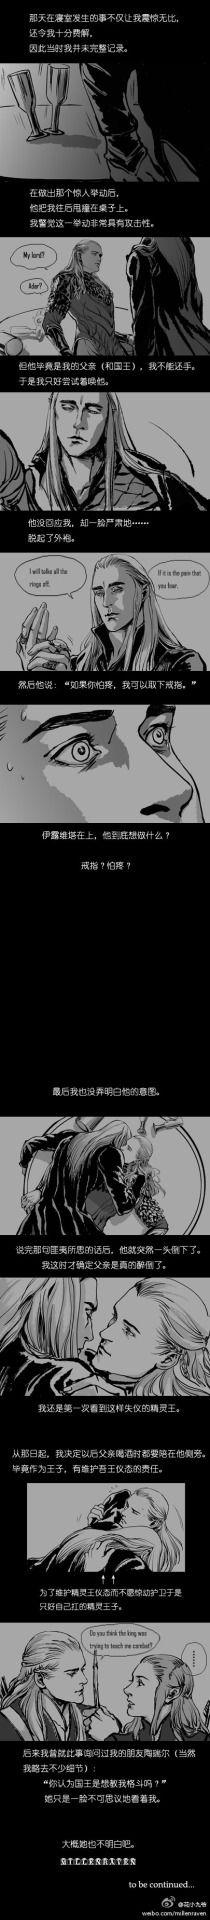 tumblr_nj9z3o06lT1qizt8ro2_r1_1280.jpg (JPEG Image, 210×1920 pixels)